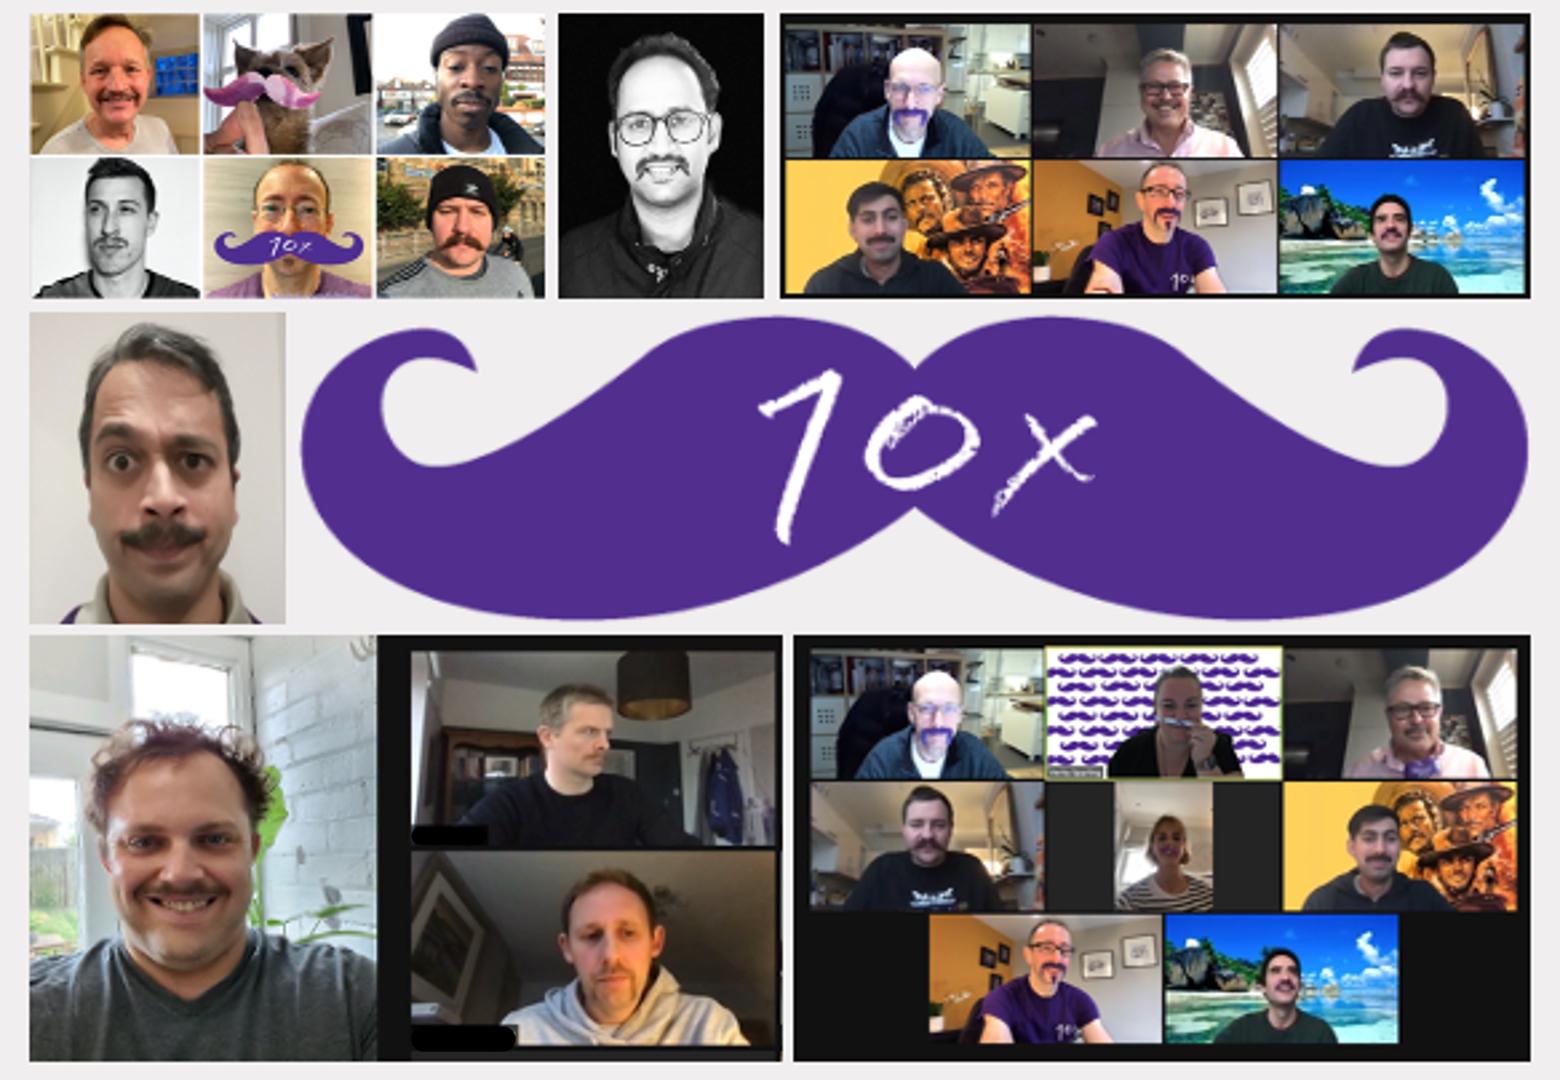 10x Movember 2020